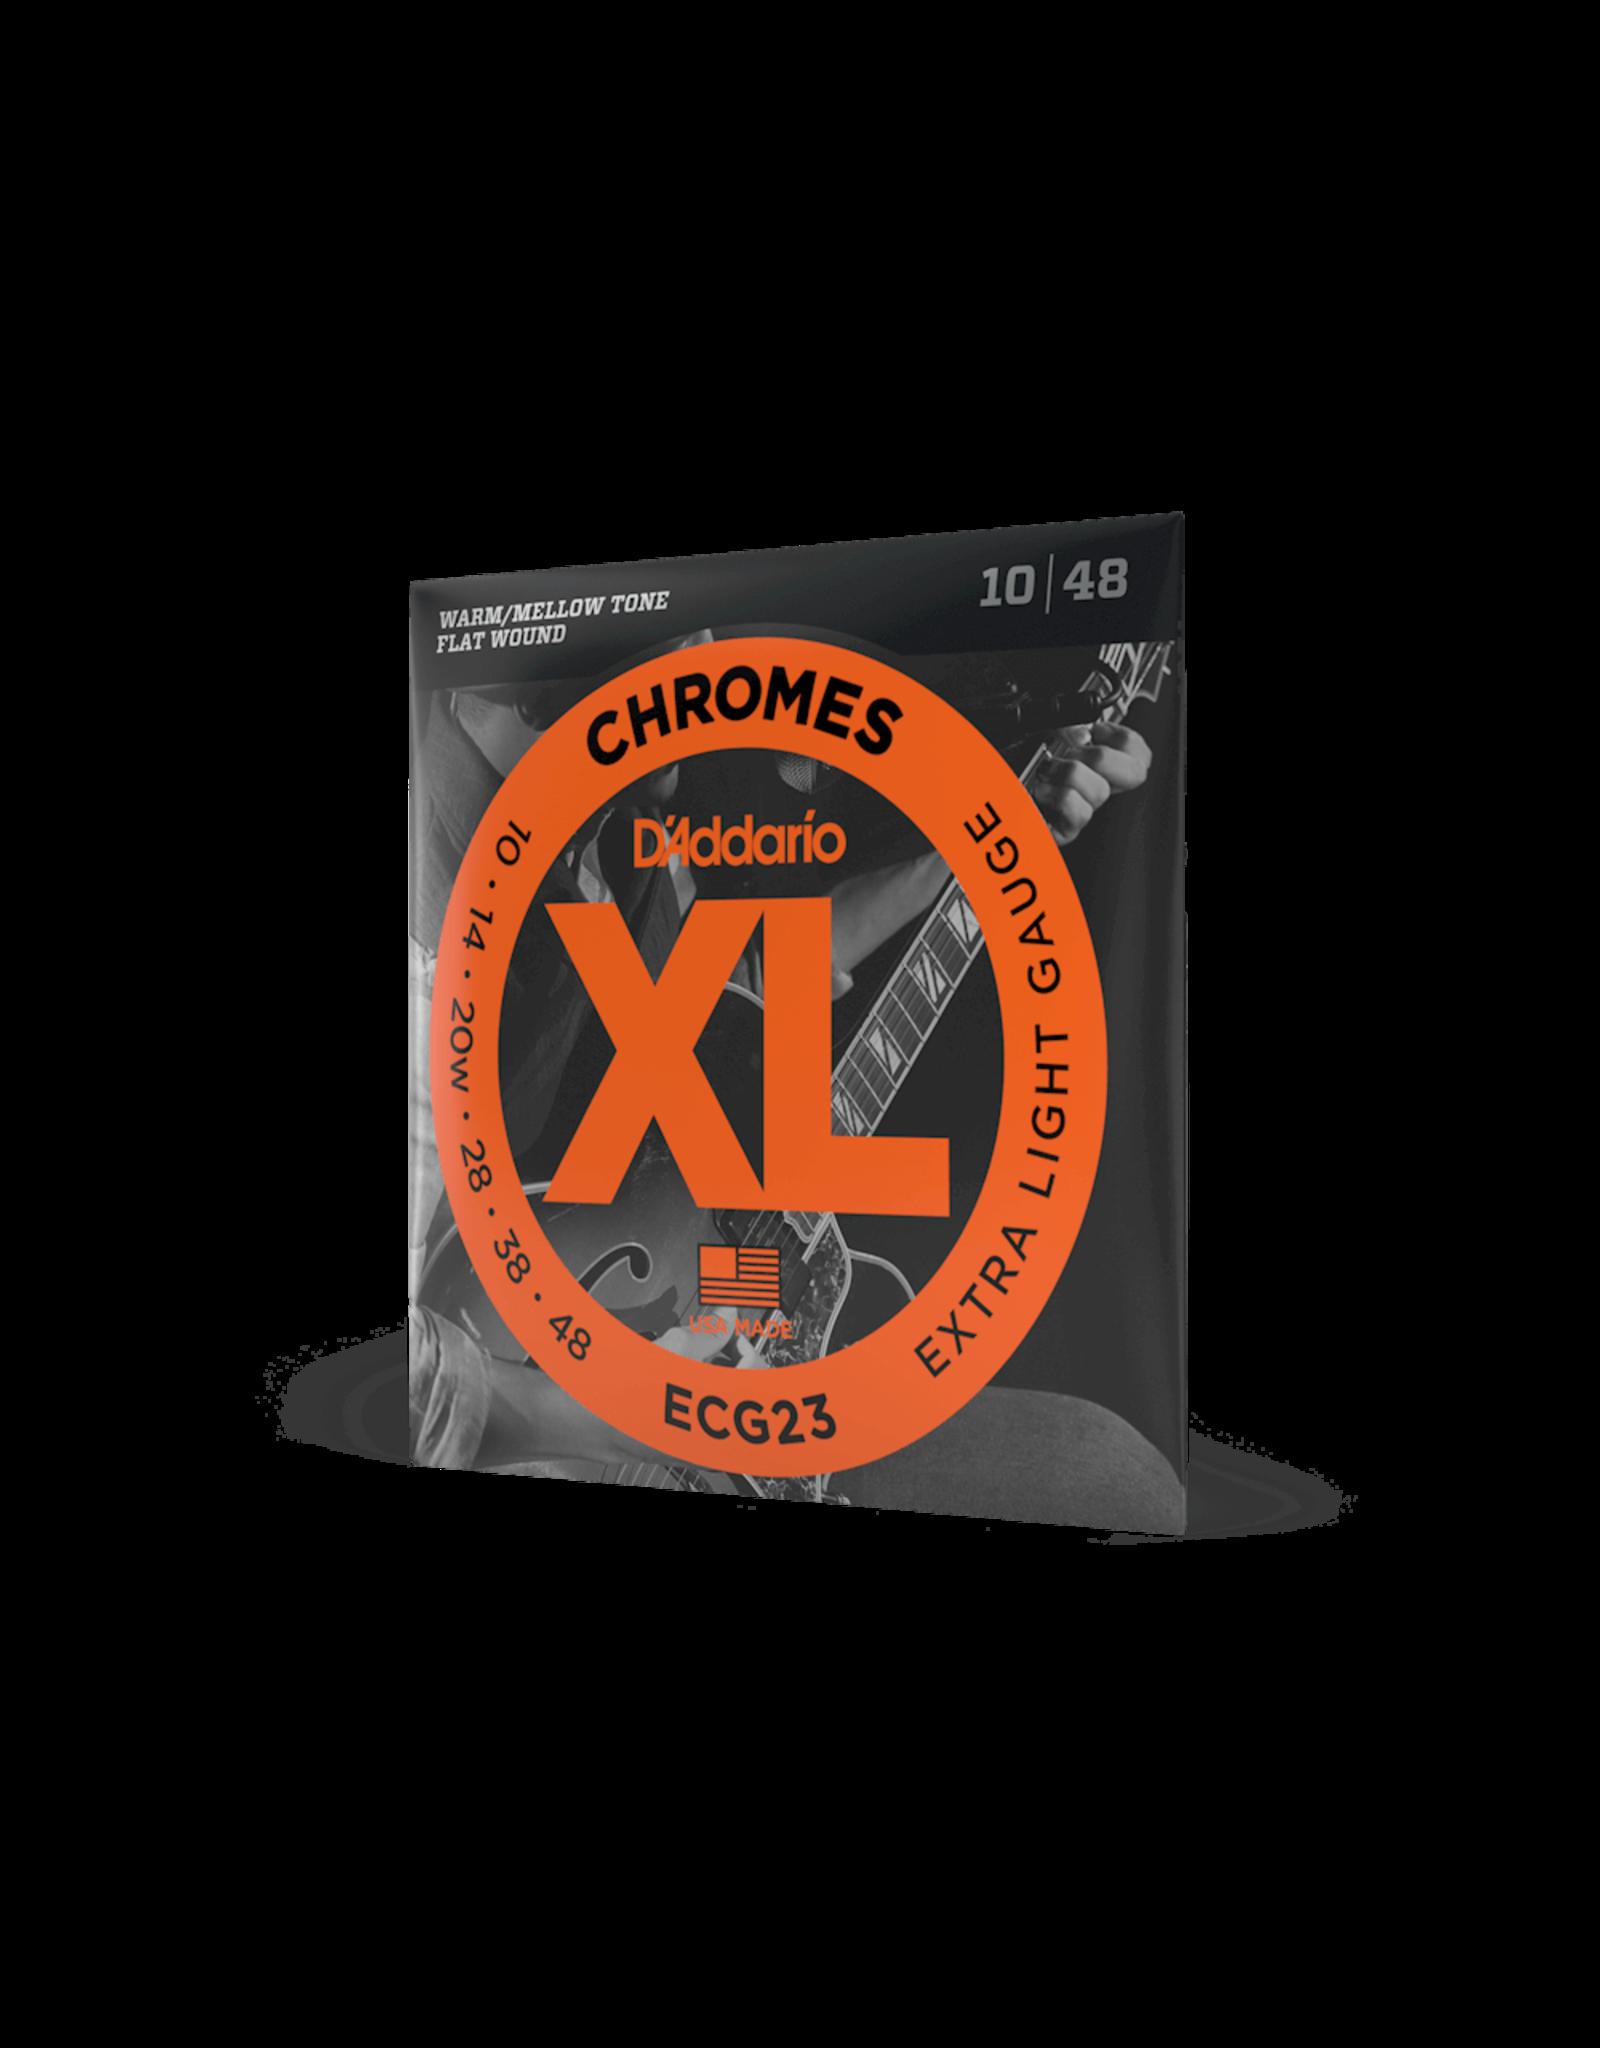 D'Addario D'Addario ECG23 Chromes Flatwound Extra Light Electric Strings